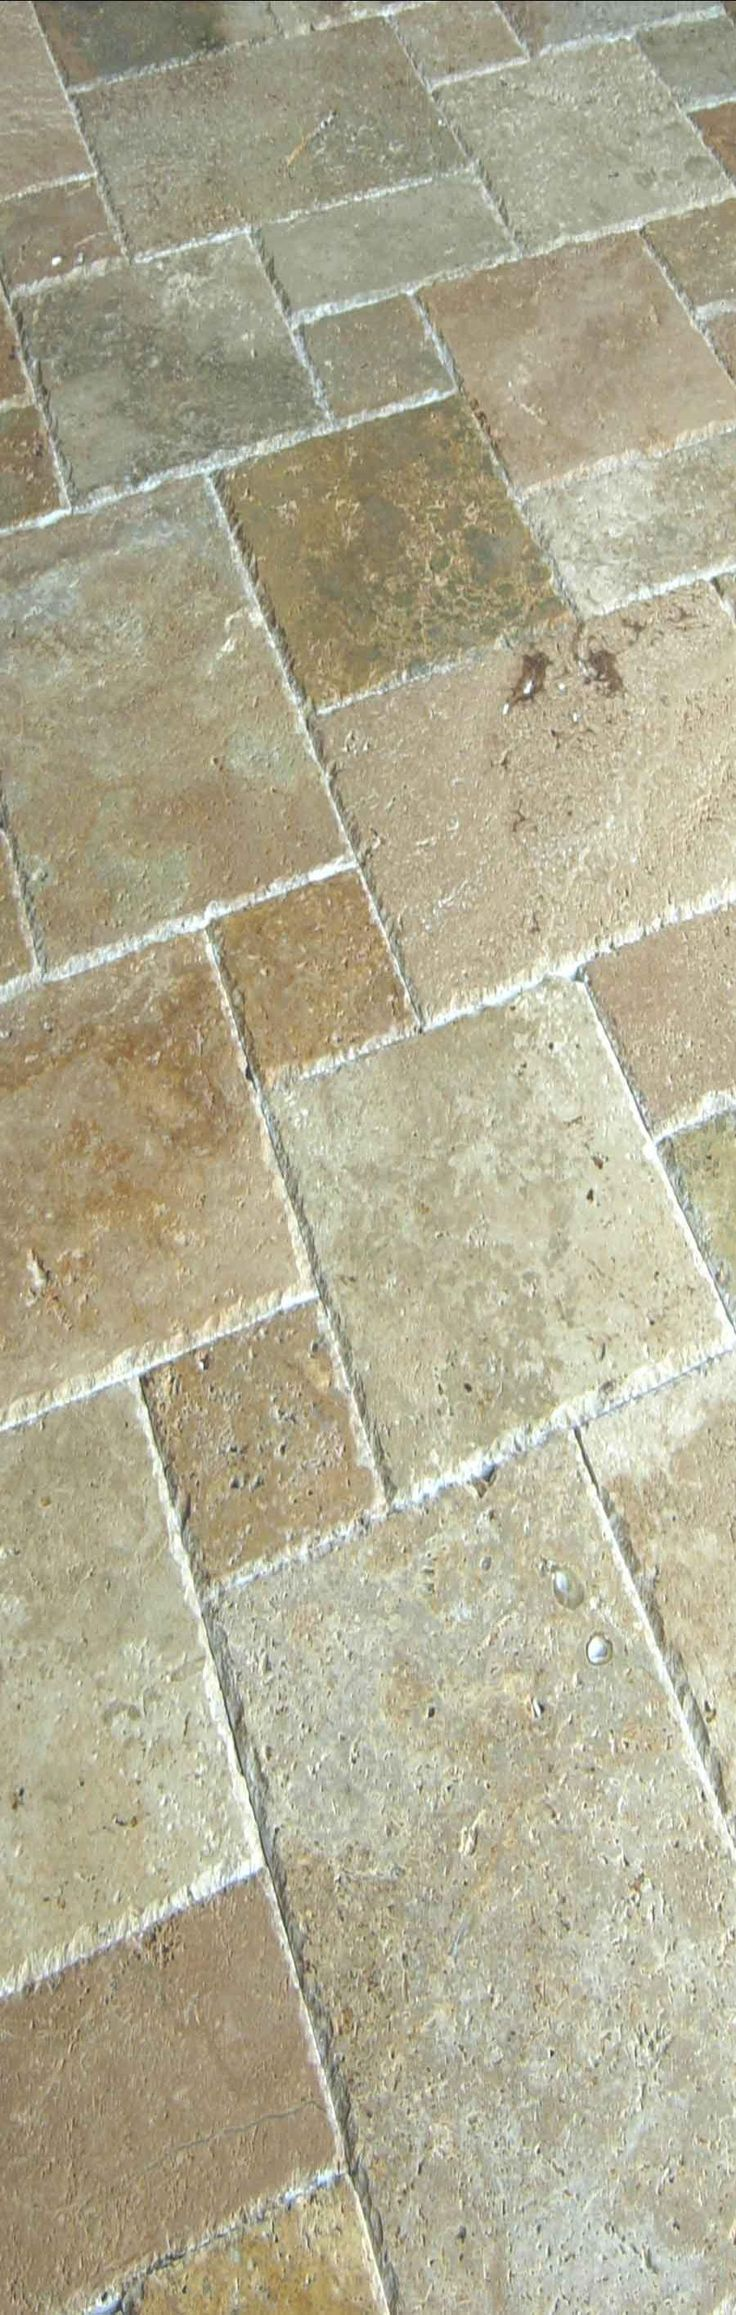 laminate tile flooring laminate flooring kitchen 25 best ideas about Laminate Tile Flooring on Pinterest Bathroom flooring Tile floor kitchen and Laminate flooring in kitchen